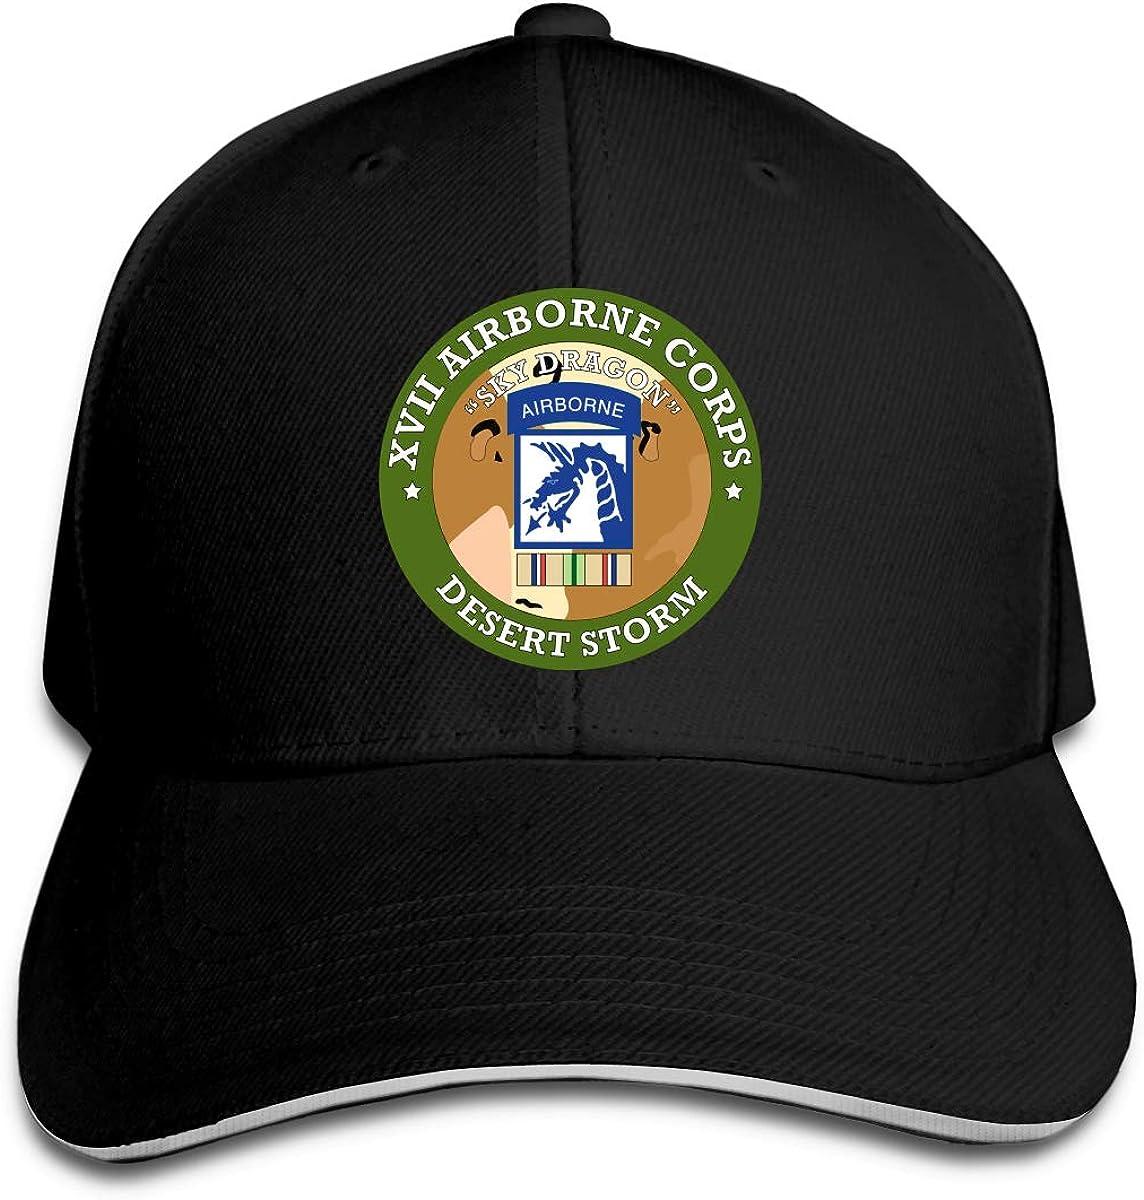 18th Airborne Corps Unisex Sandwich Cap Trucker Cap